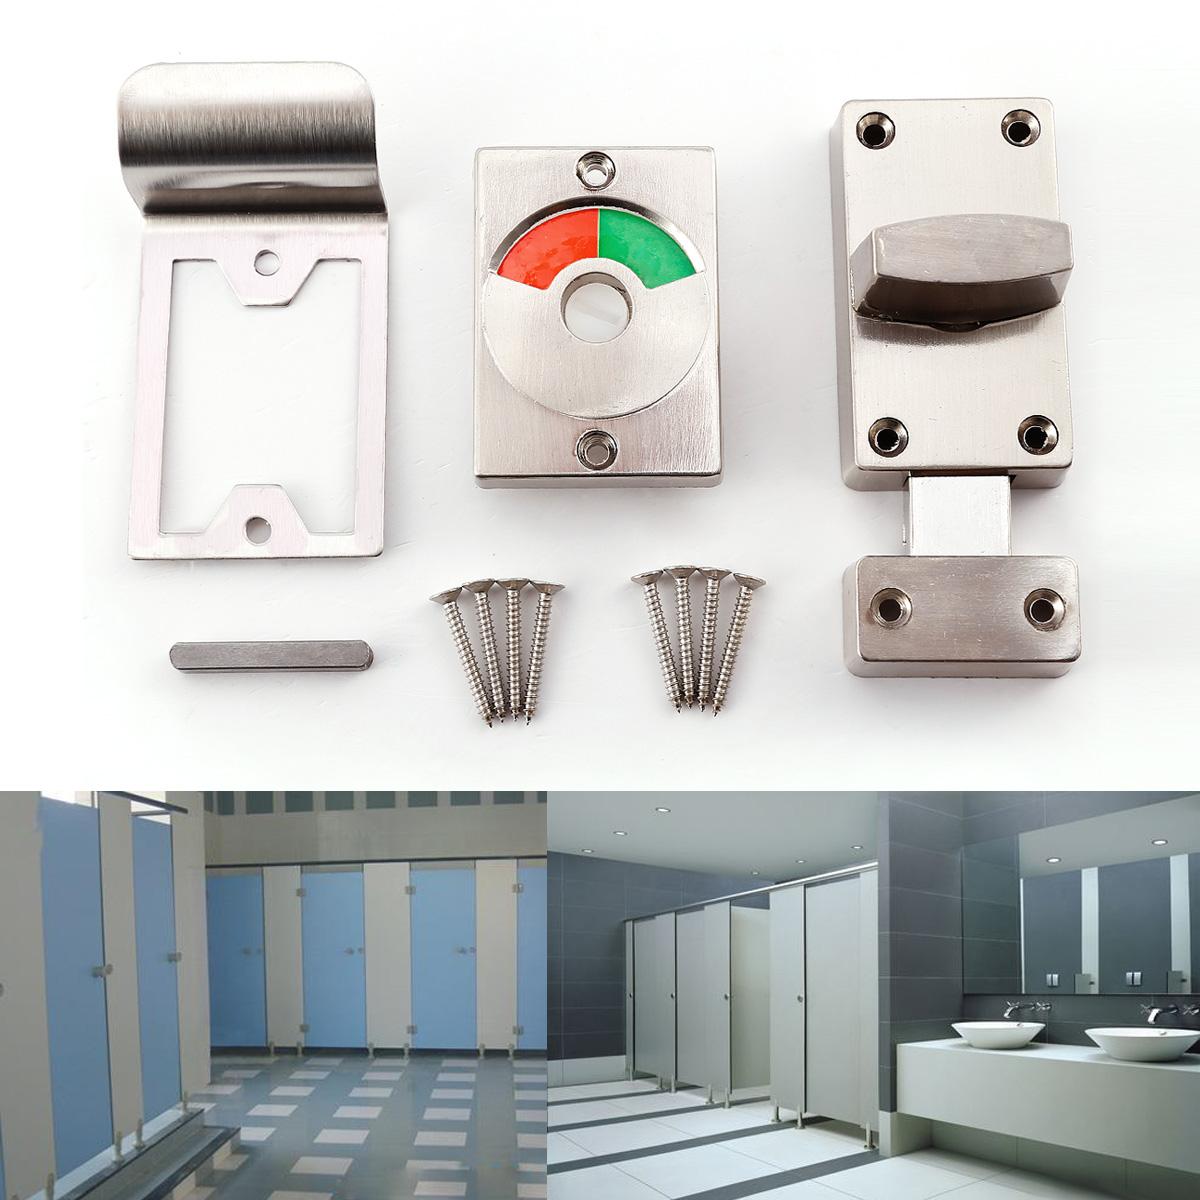 toilette badezimmer wc facility t rschloss toilettenriegel t rriegel schrauben ebay. Black Bedroom Furniture Sets. Home Design Ideas